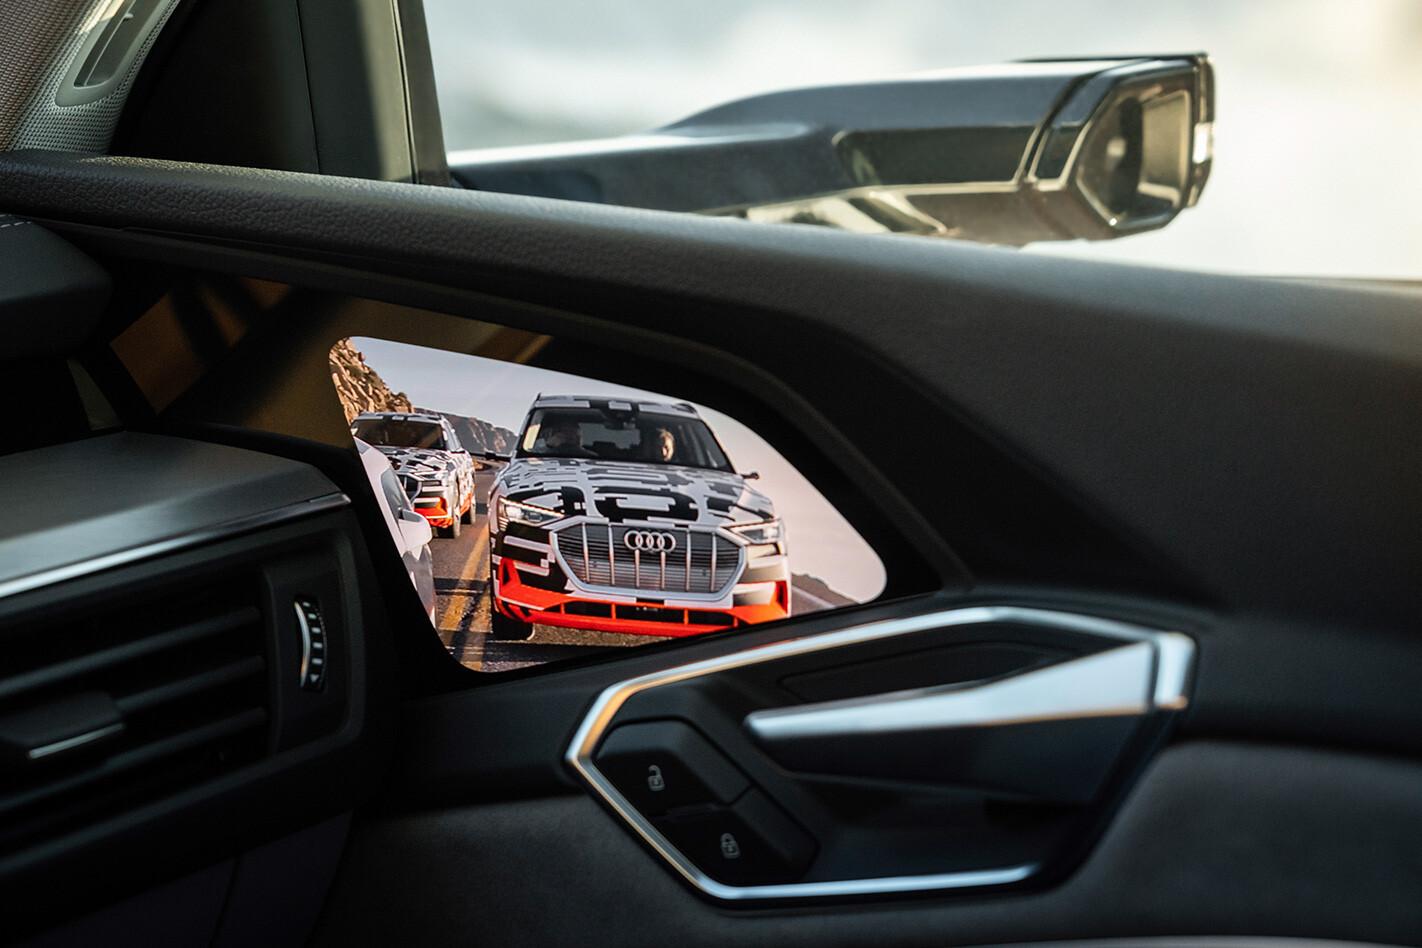 Audi E Tron Miror Jpg